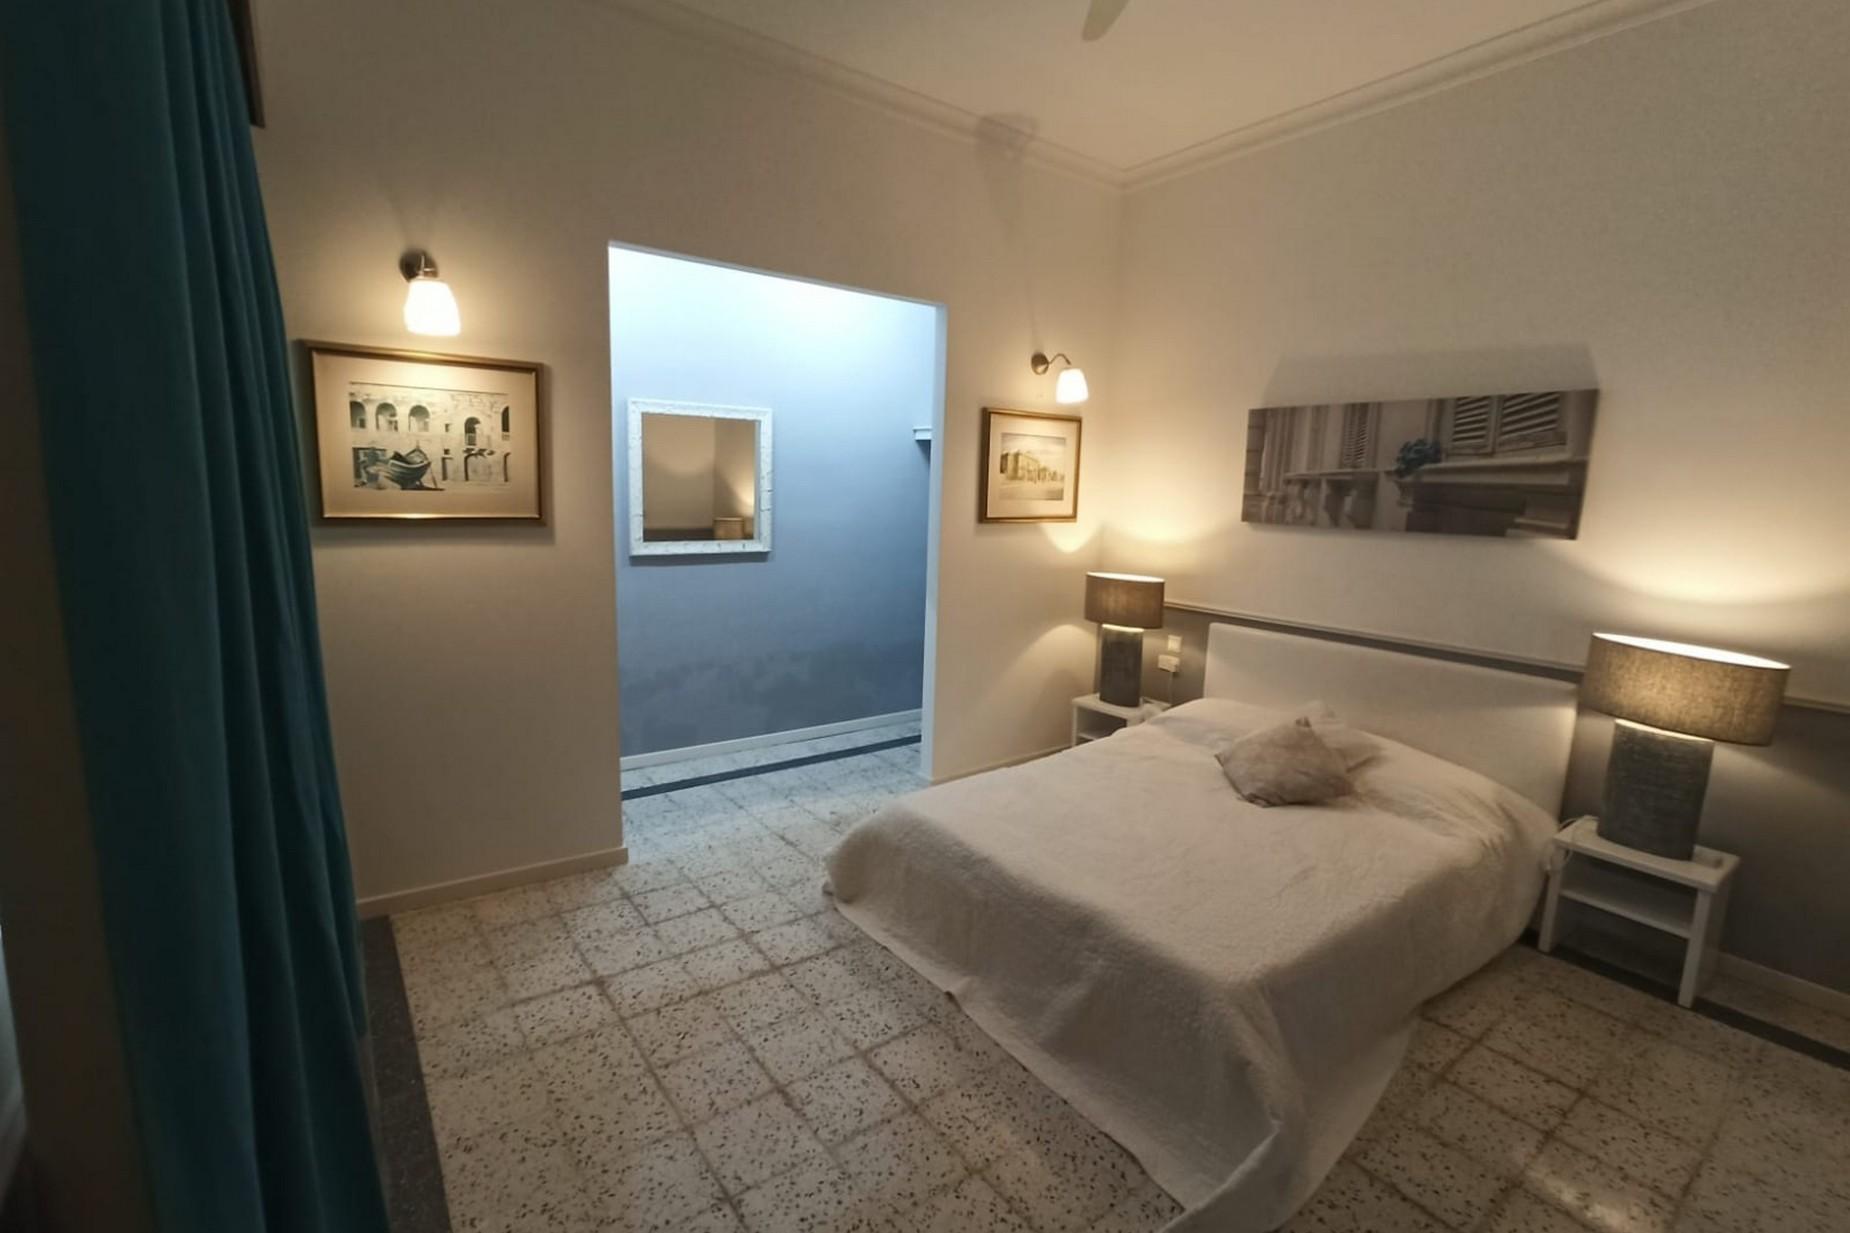 3 bed Town House For Rent in Birkirkara, Birkirkara - thumb 6